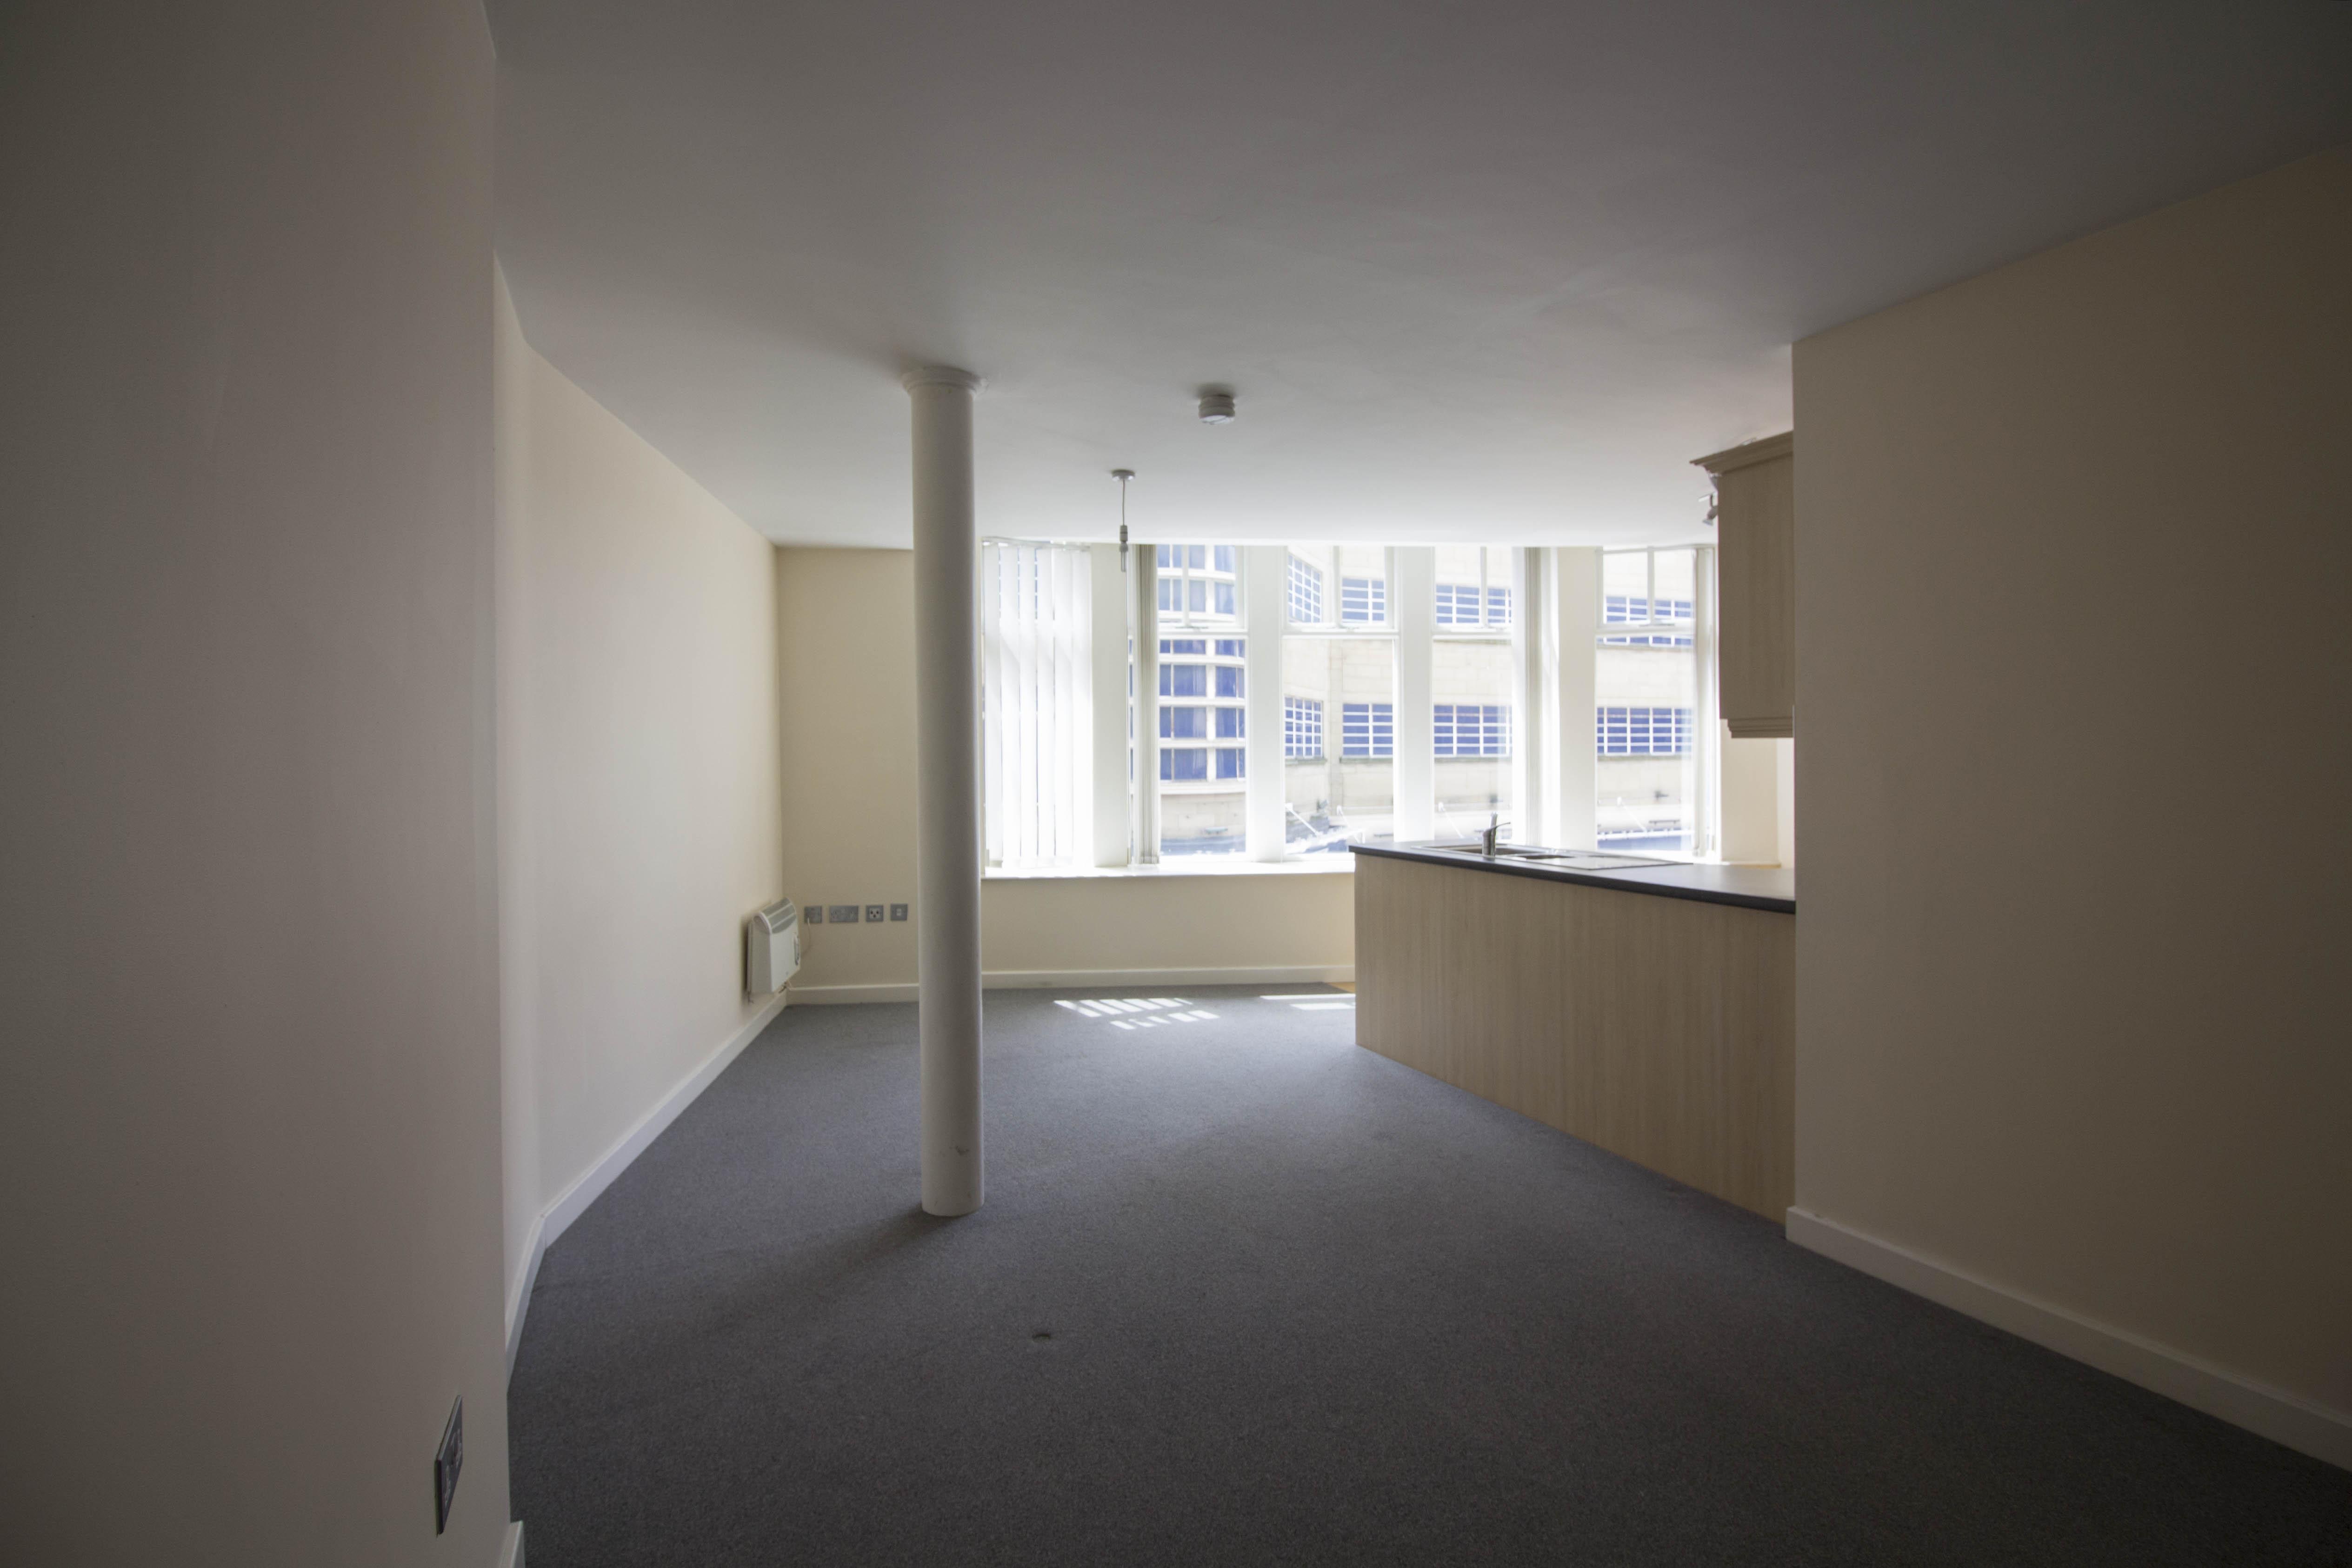 1 Bed, Reception room